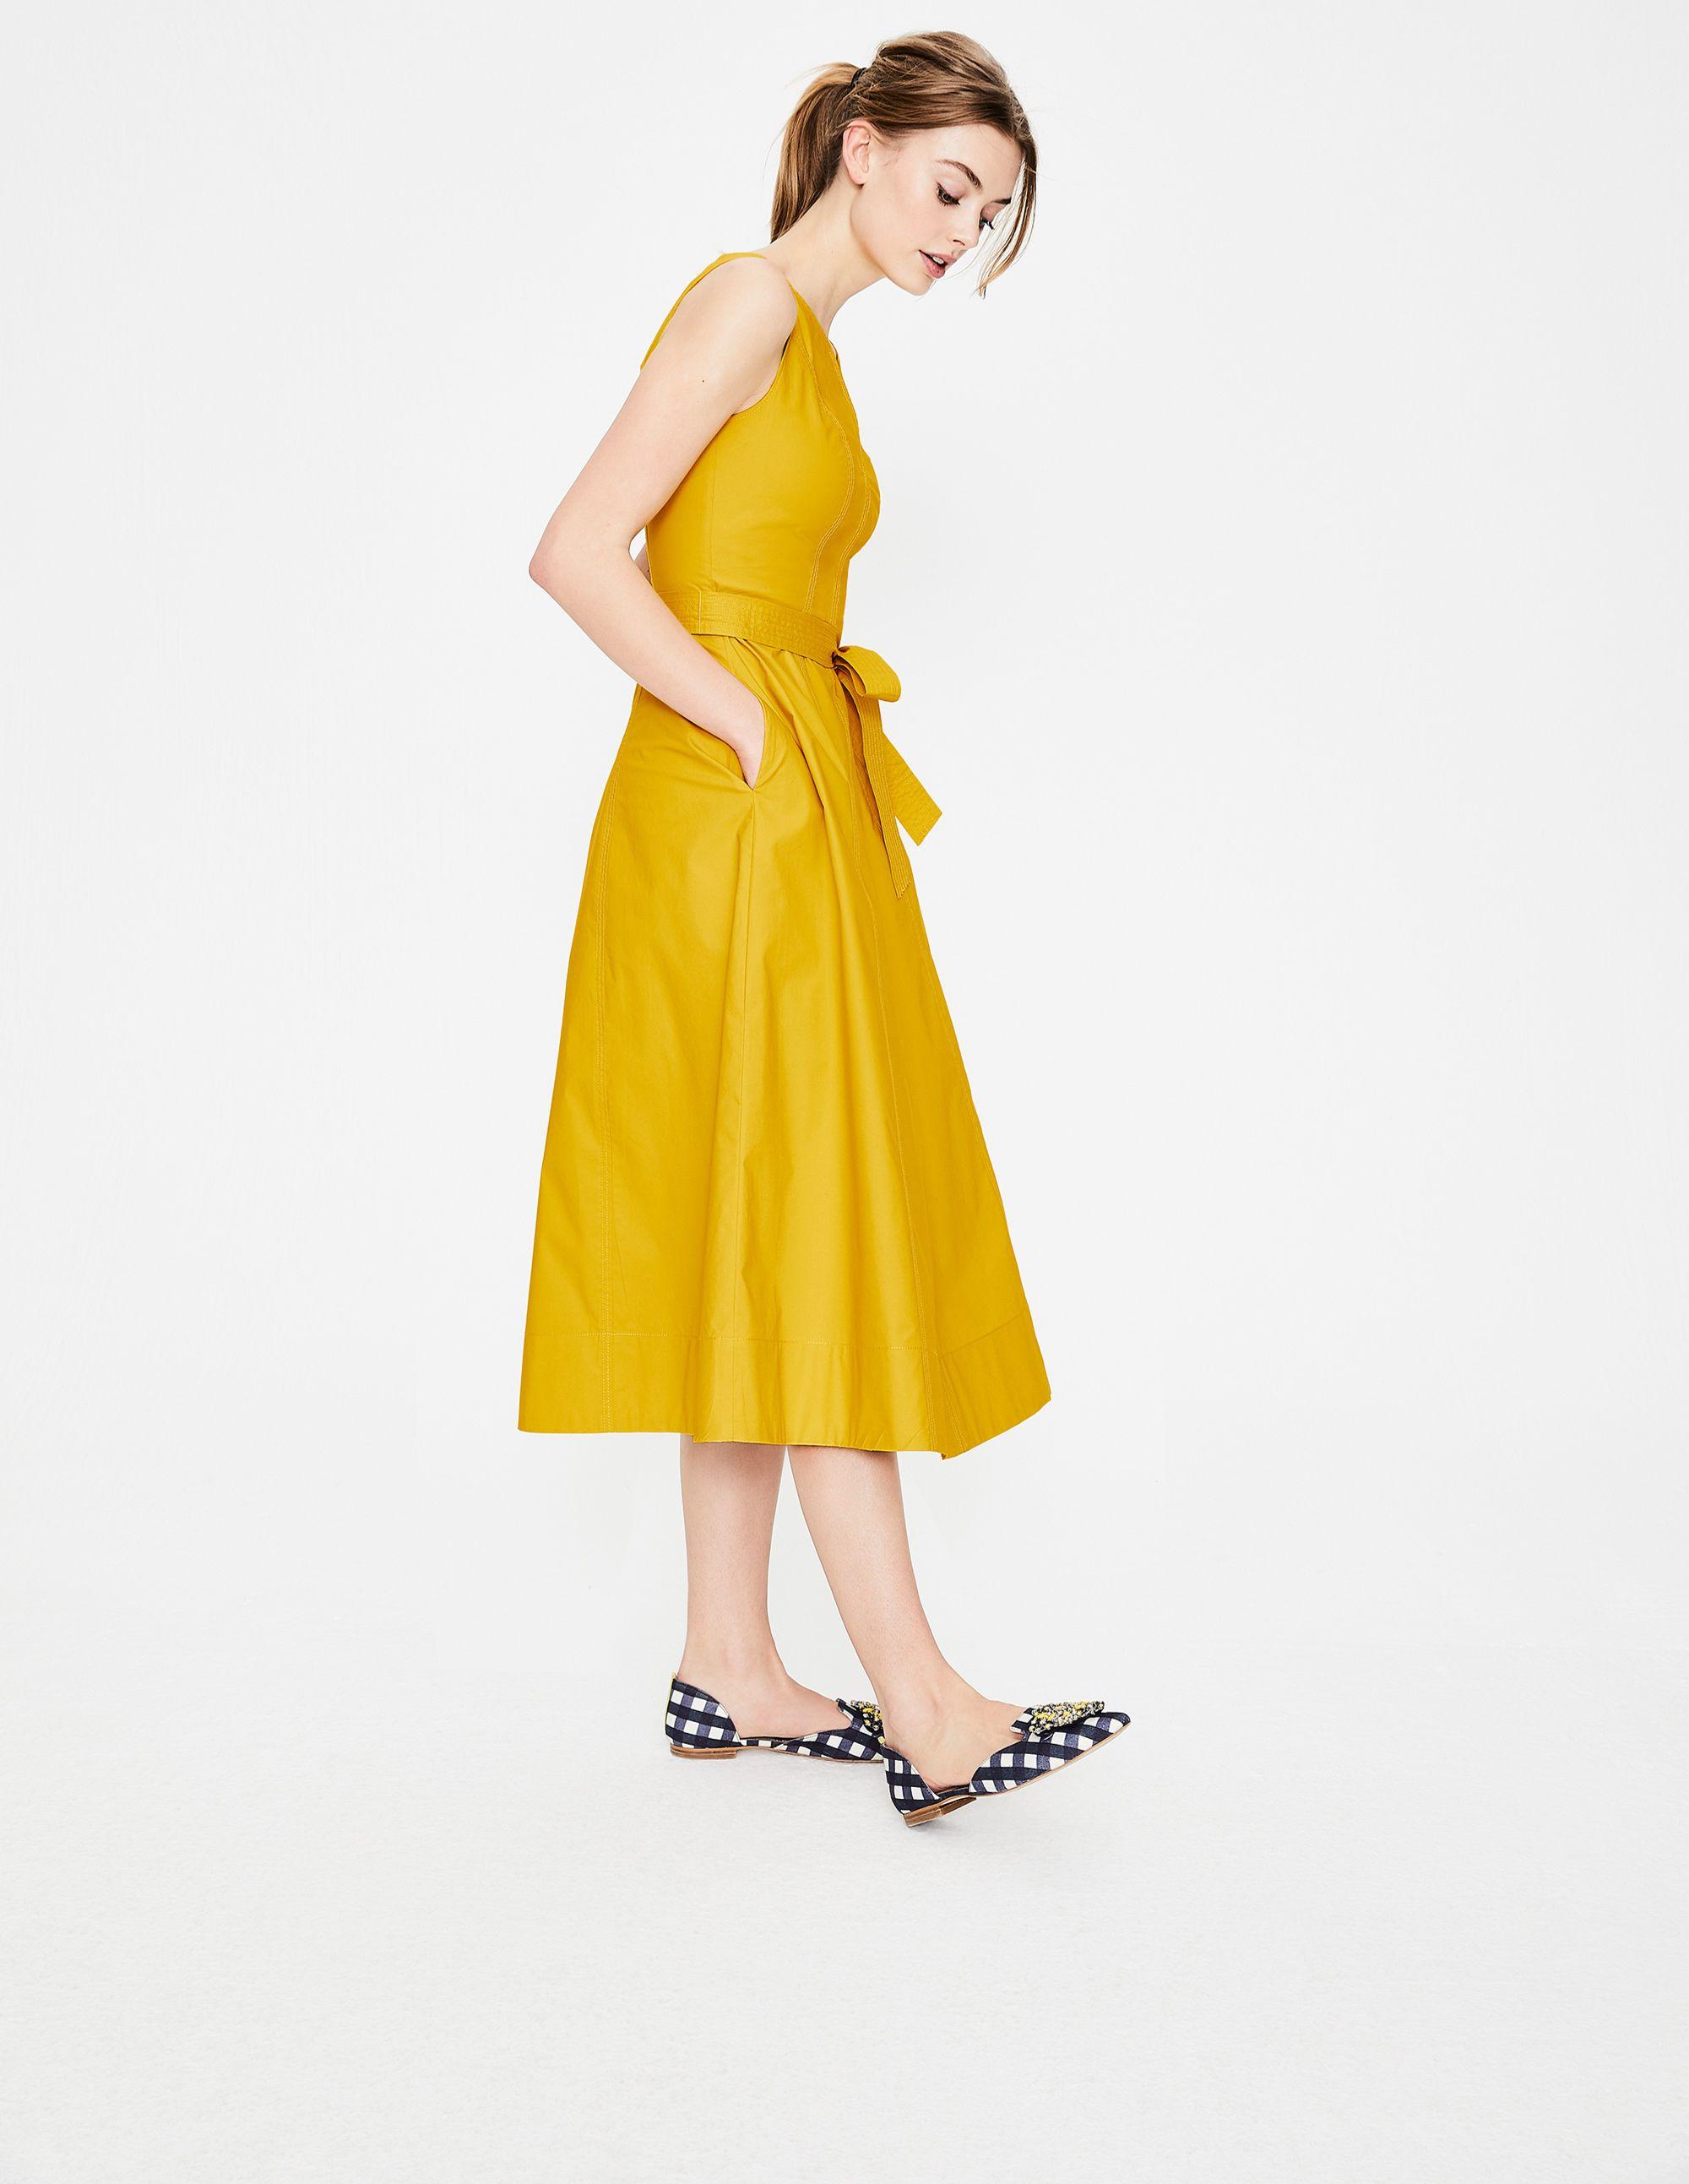 Joyce Dress W0126 Day Dresses At Boden Dresses Day